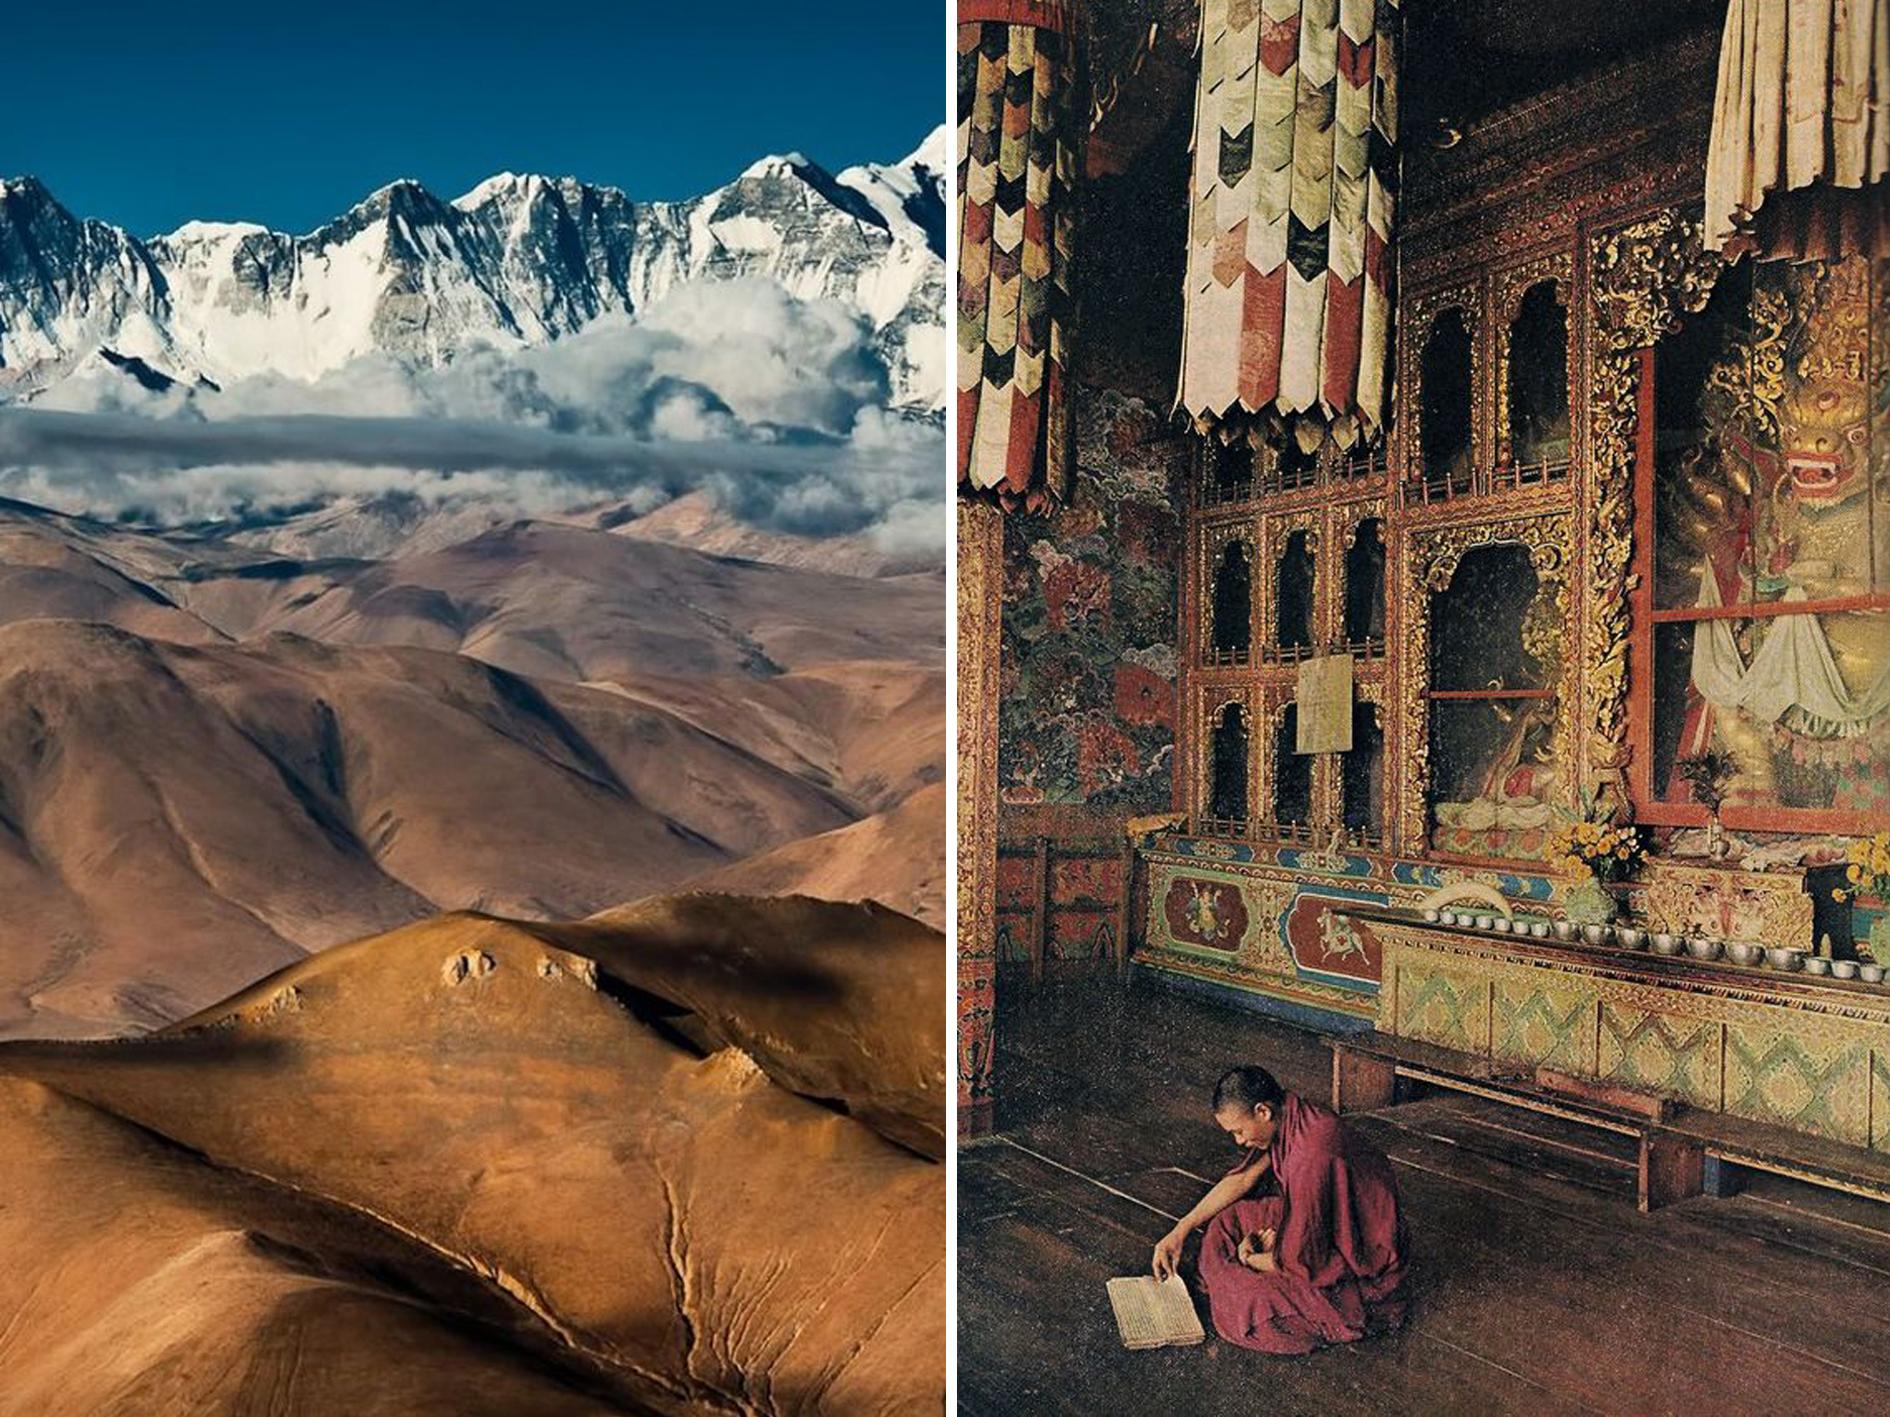 Tibet - Allegra Ghiloni.jpg